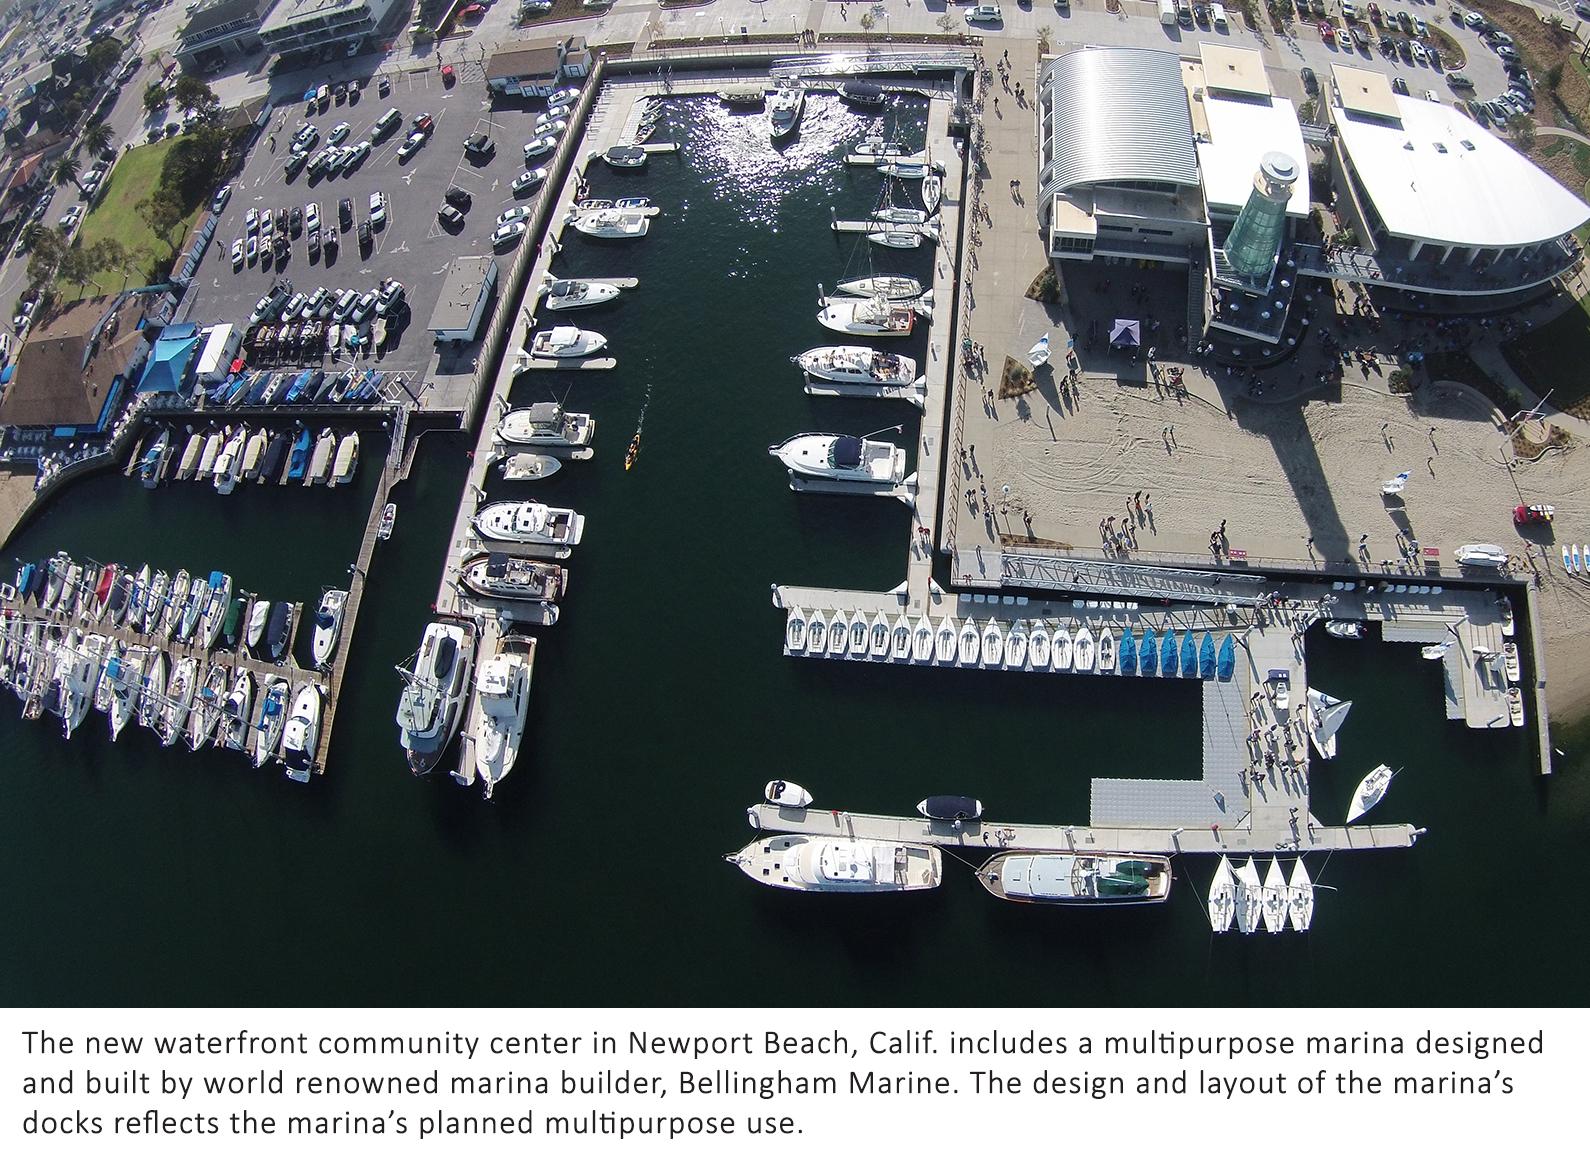 concrete floating docks by Bellingham Marine were installed at Marina Park